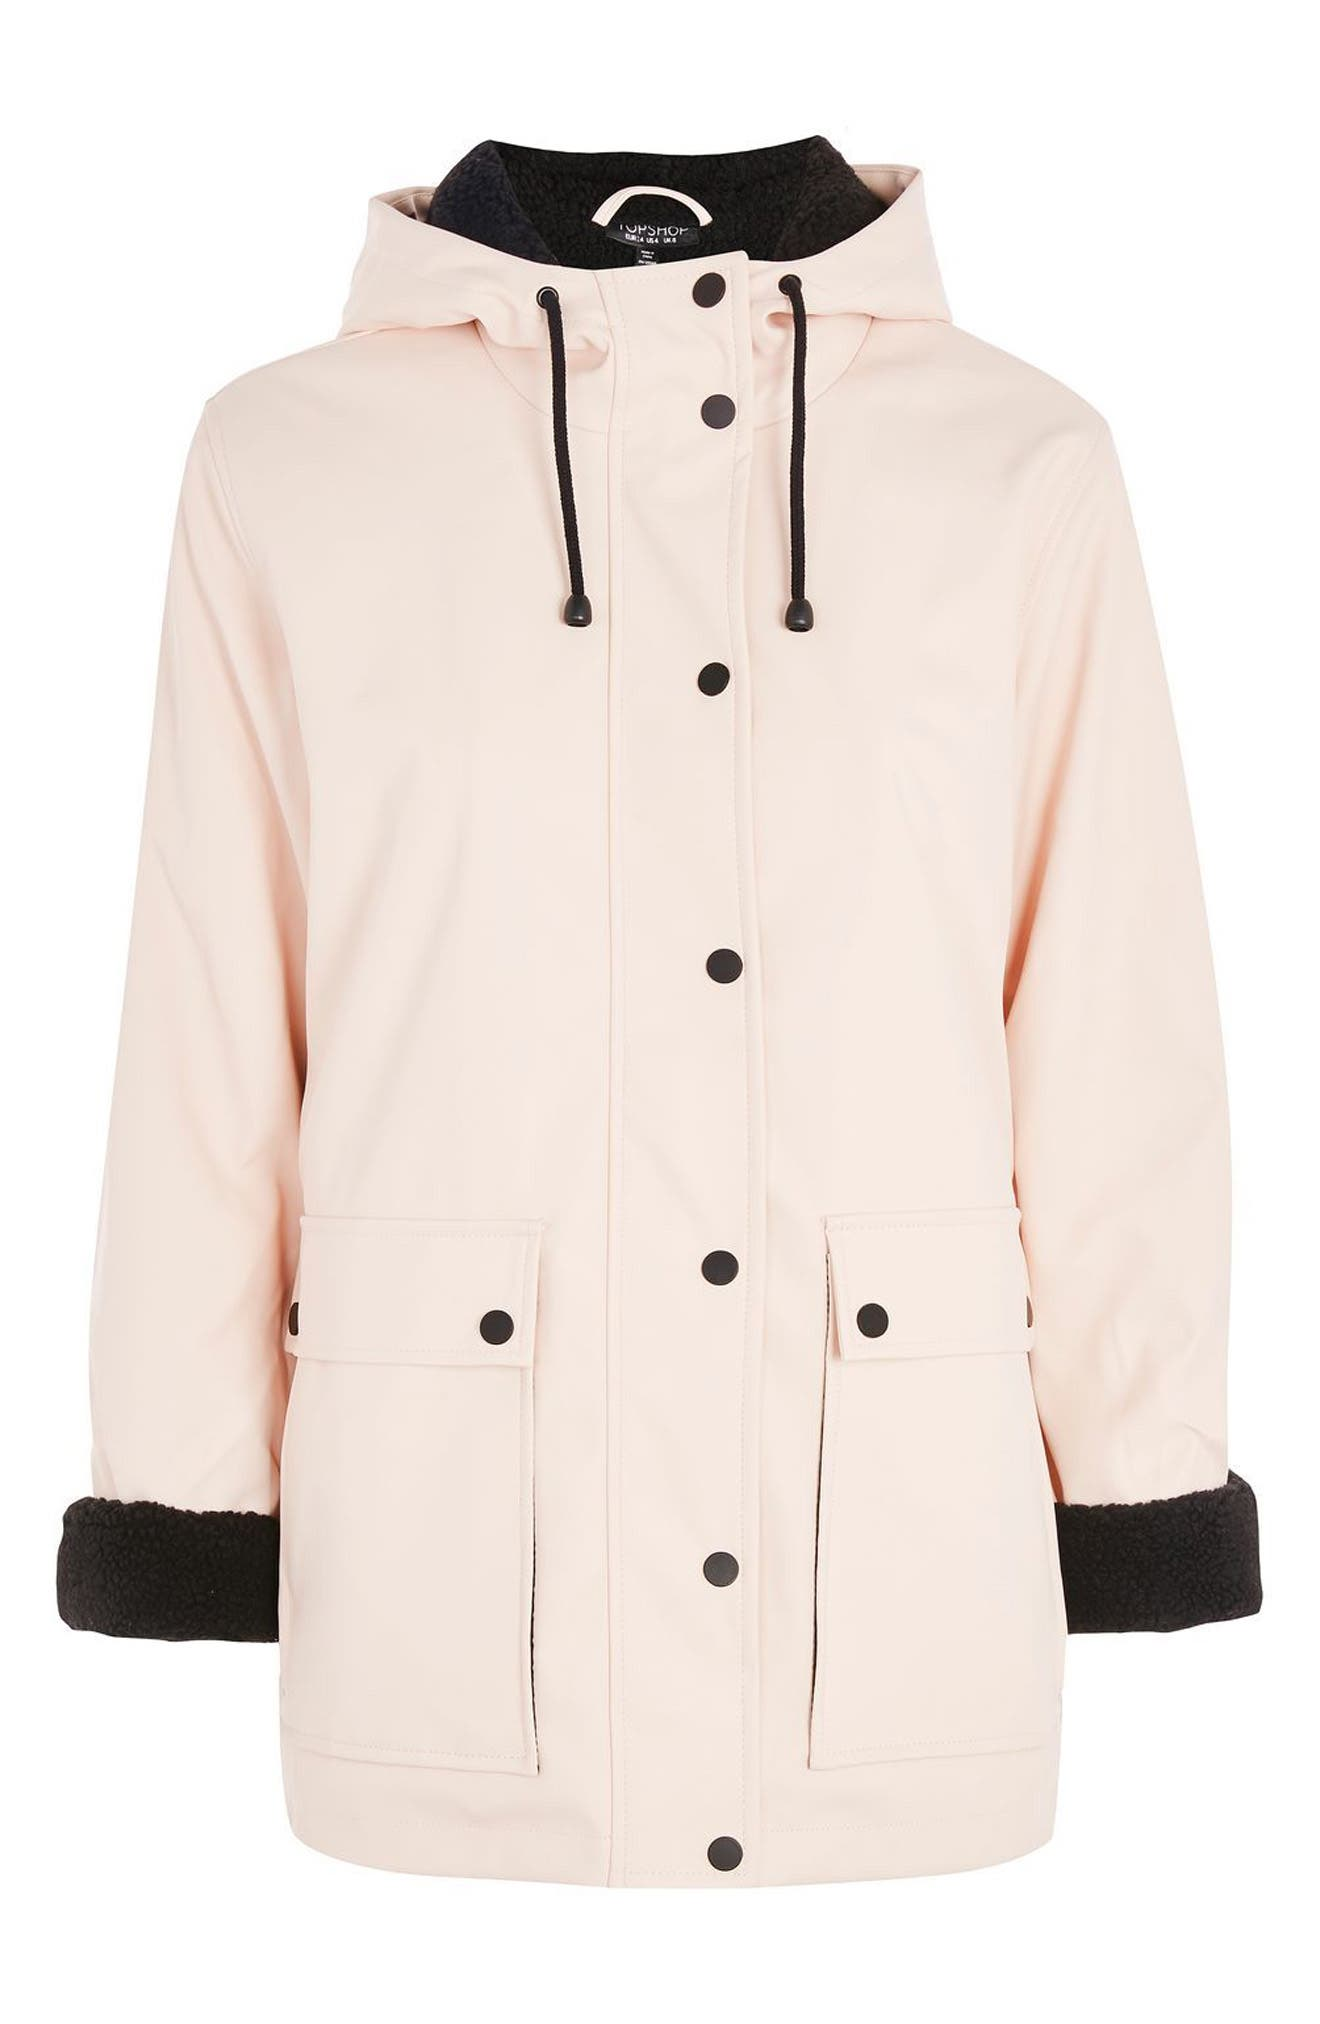 Hooded Raincoat,                             Alternate thumbnail 4, color,                             Light Pink Multi